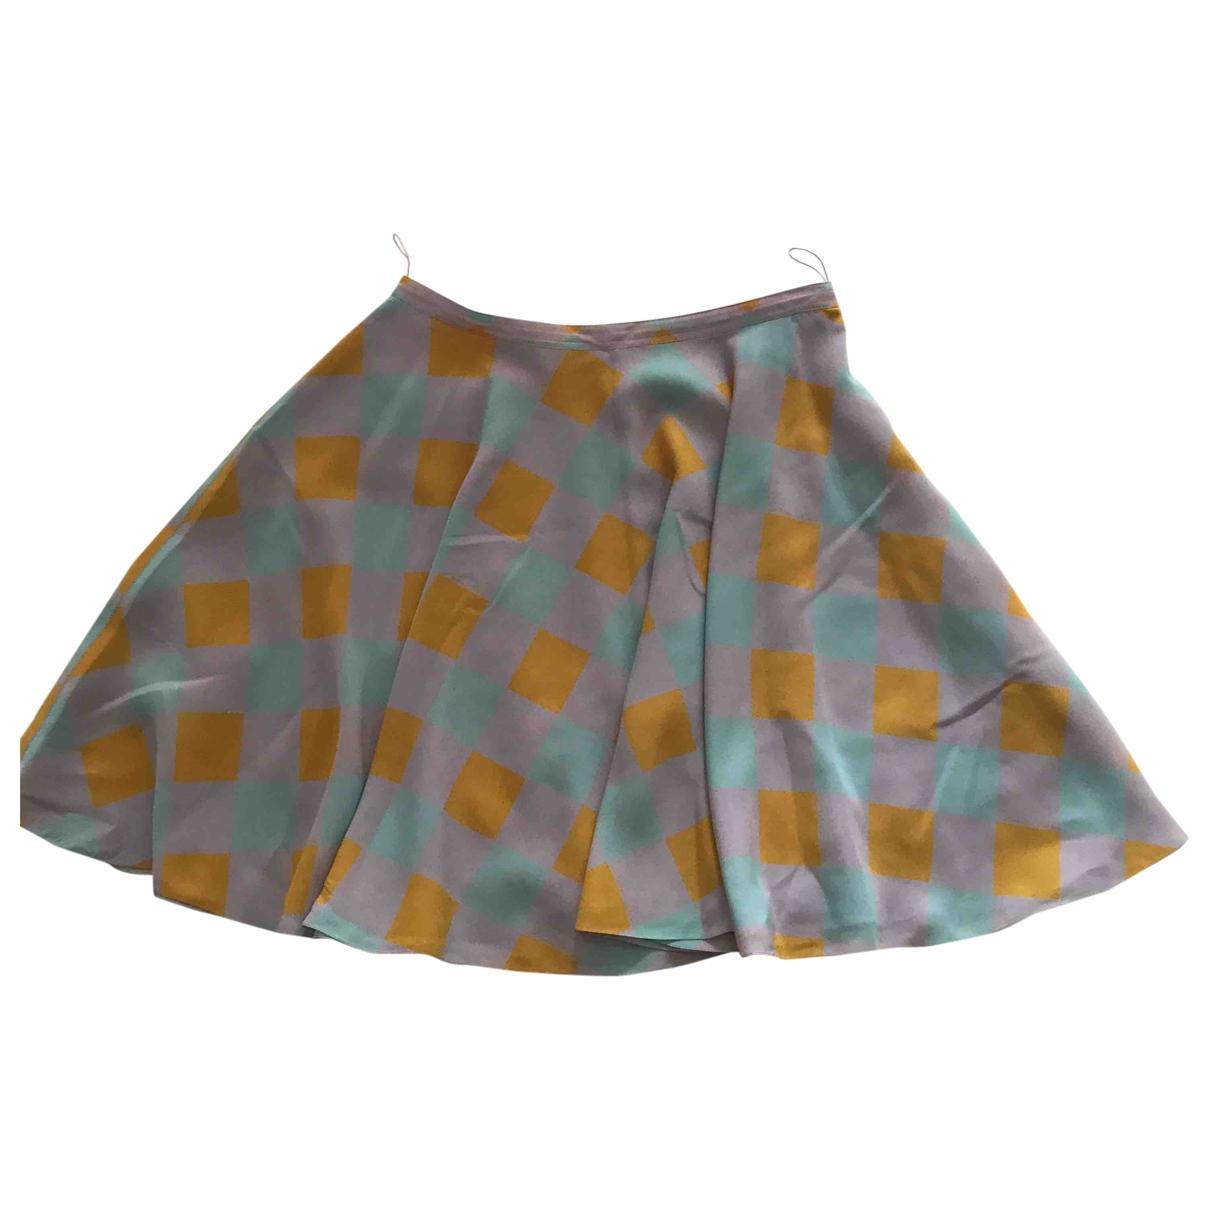 Nina Ricci \N Multicolour Silk skirt for Women 38 FR